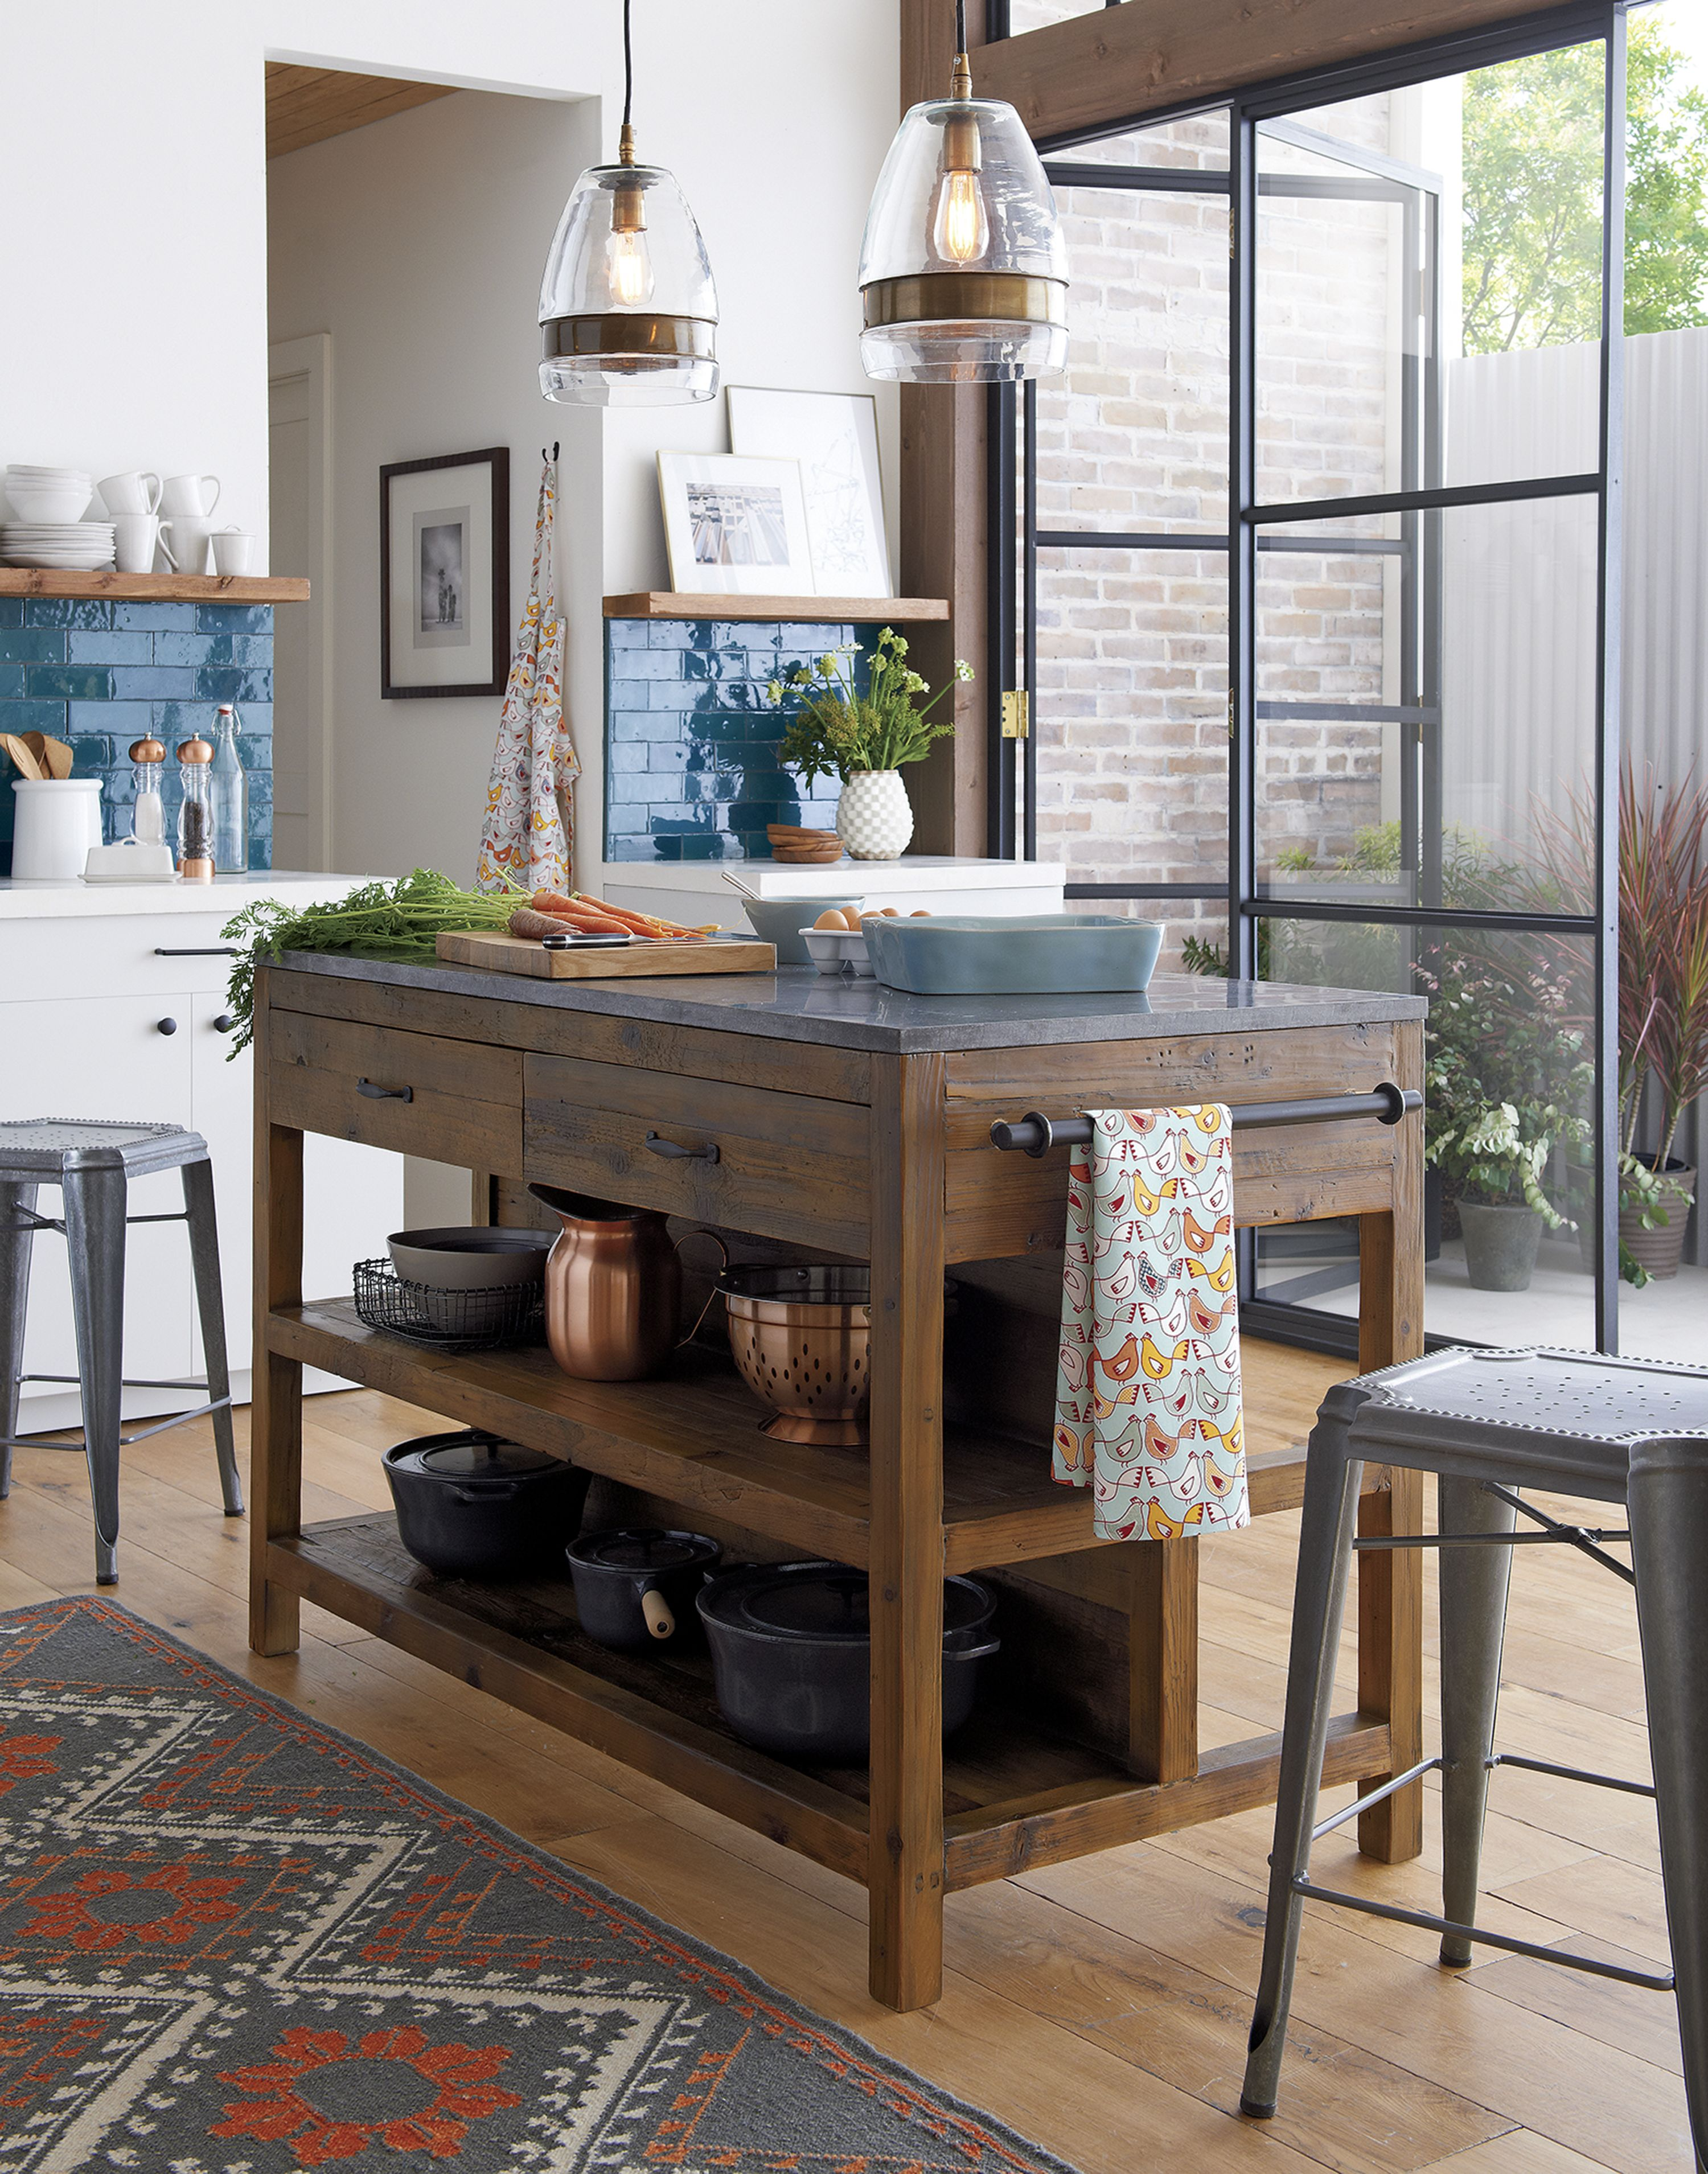 Shop Stylish Kitchen Islands & Carts | Crate and Barrel